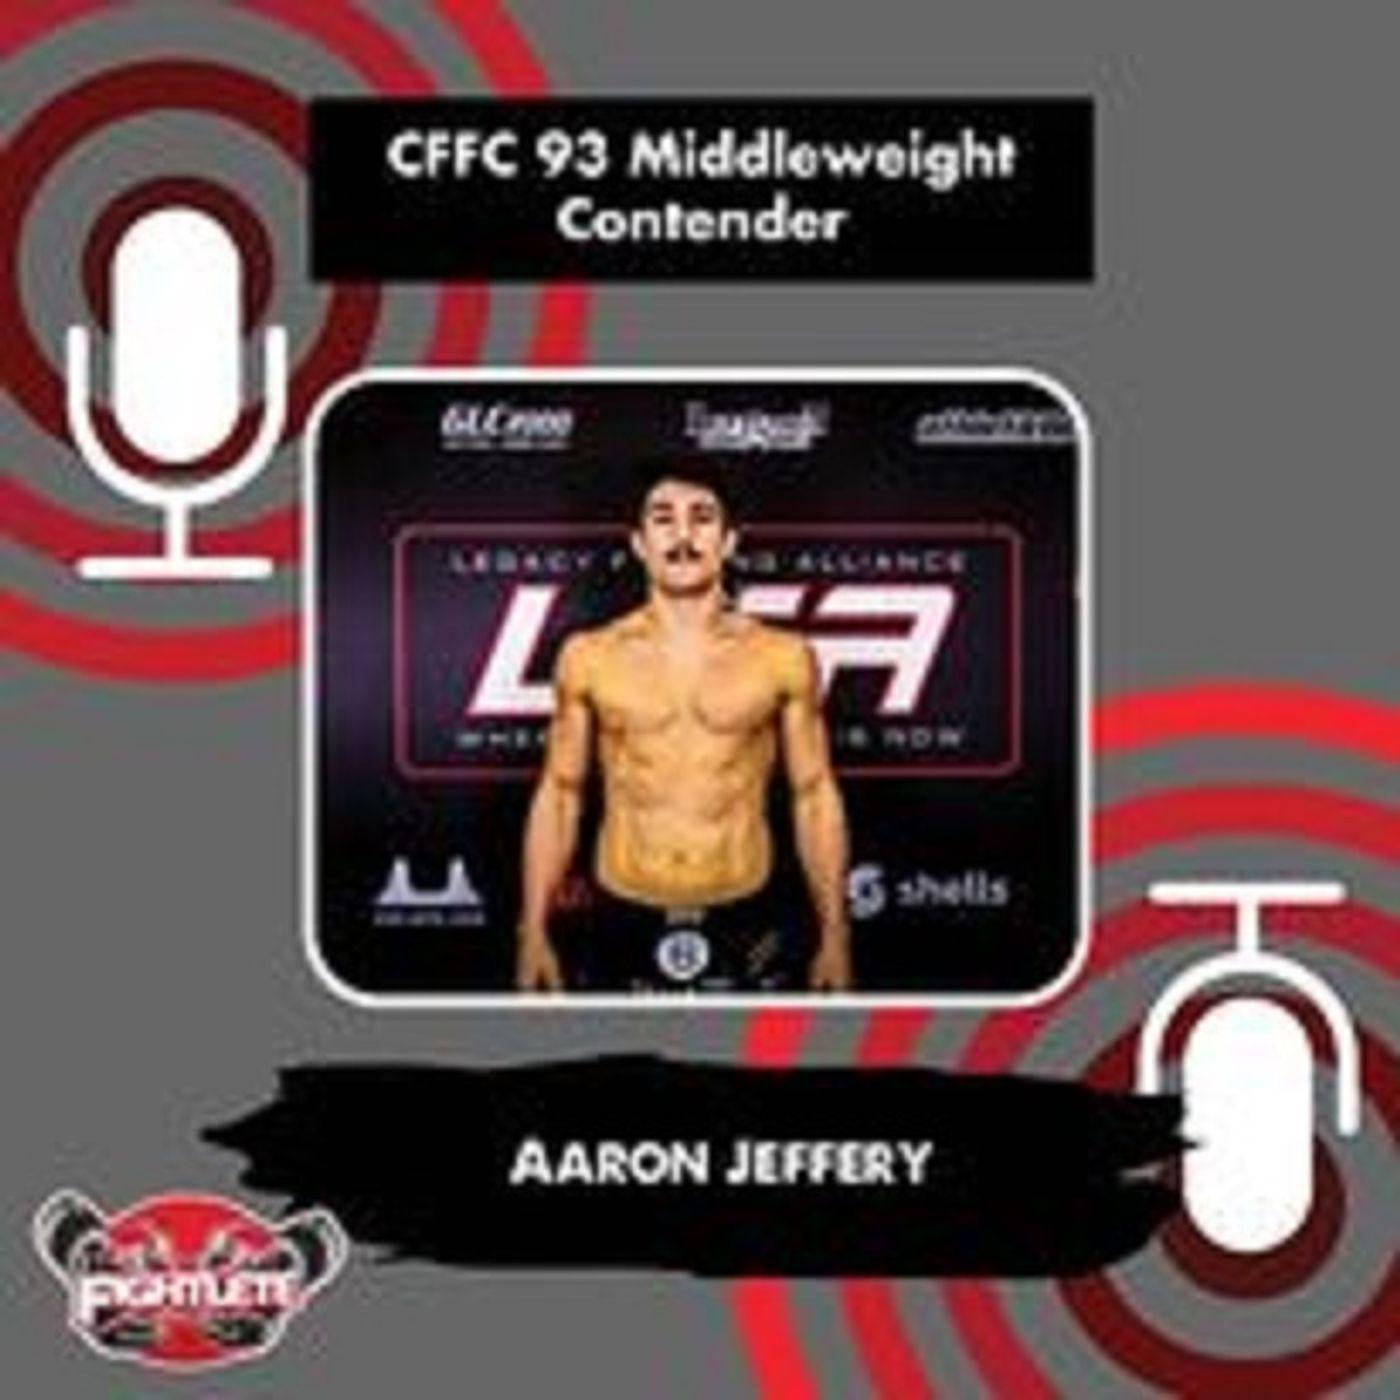 CFFC93 Main Event Middleweight Aaron Jeffrey Interview